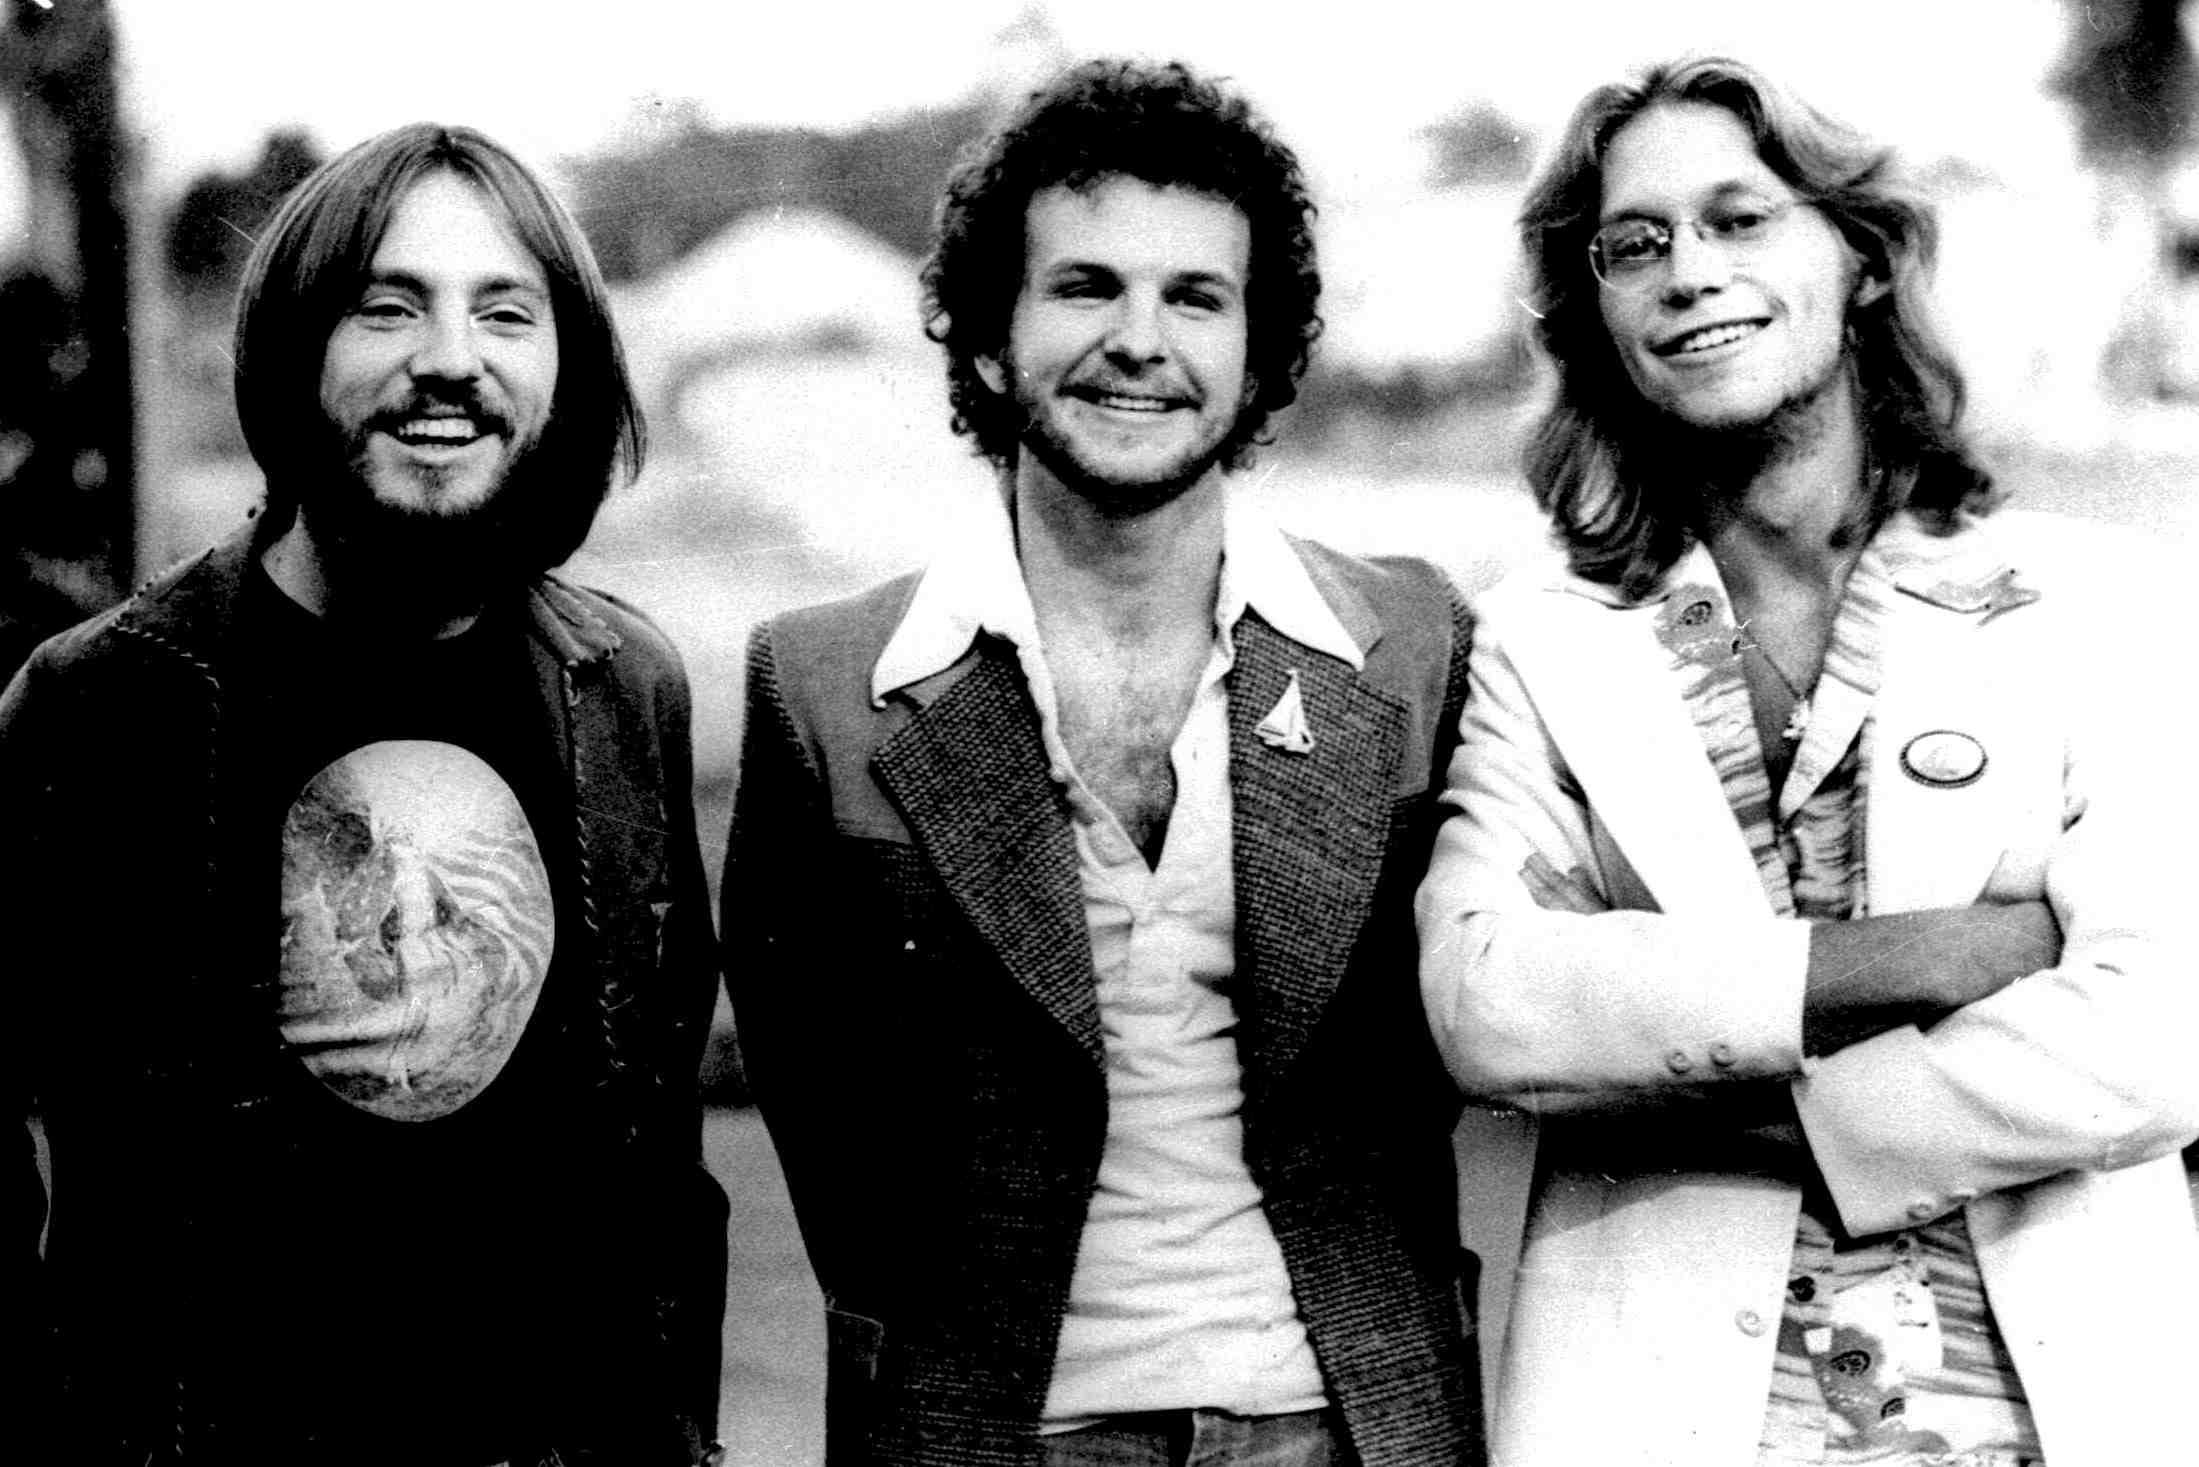 The band America